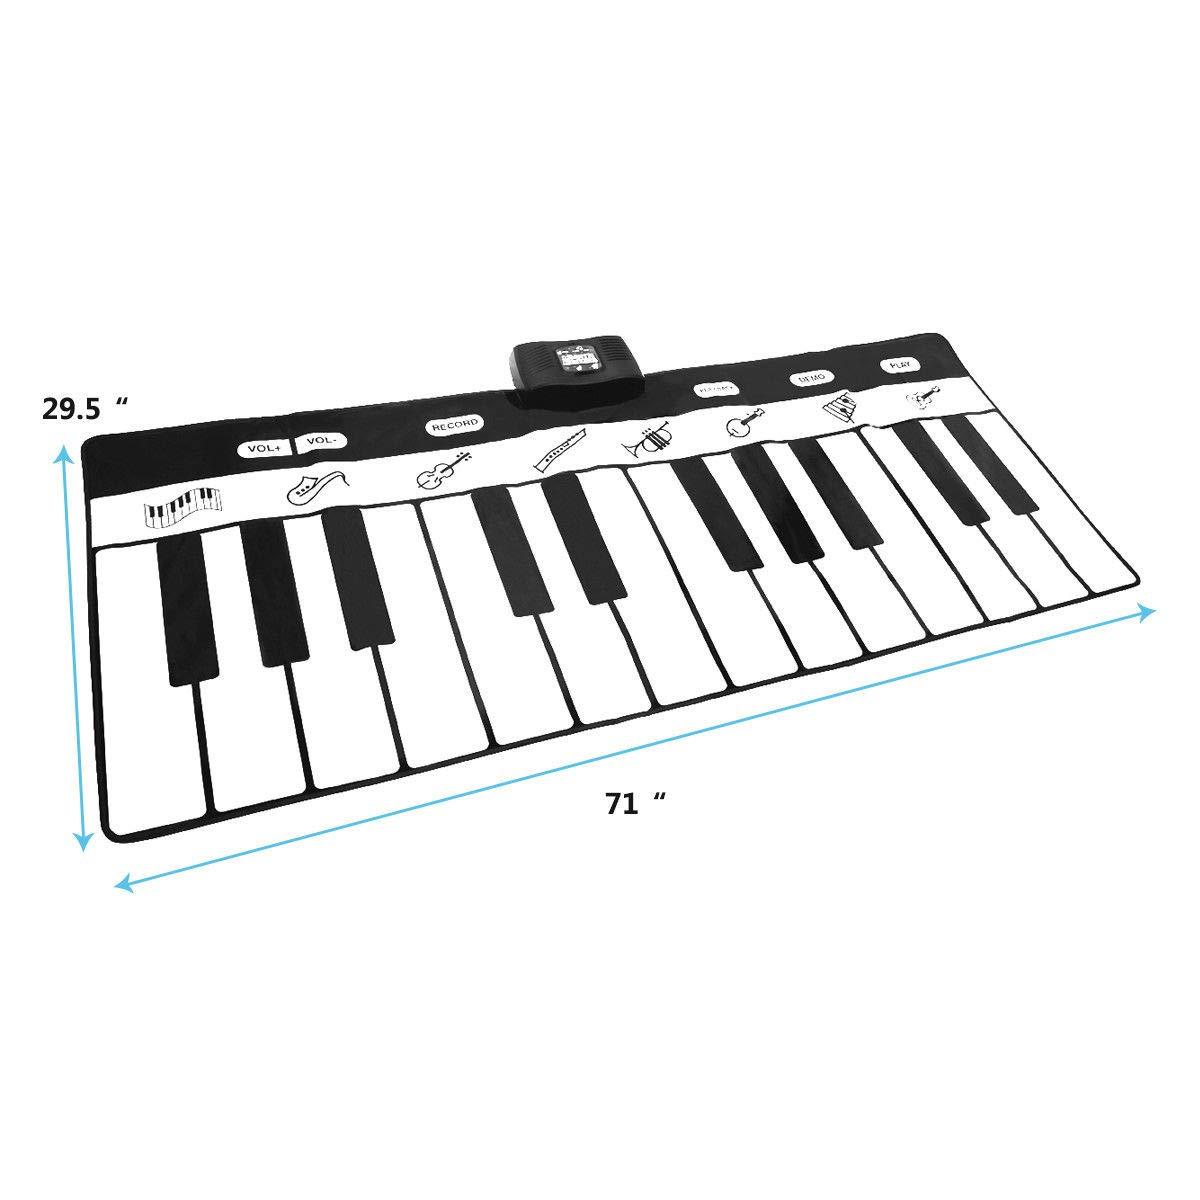 FDInspiration 71'' Kids 24-Key Keyboard Dance Gigantic Piano Playmat w/ 4 Modes with Ebook by FDInspiration (Image #4)